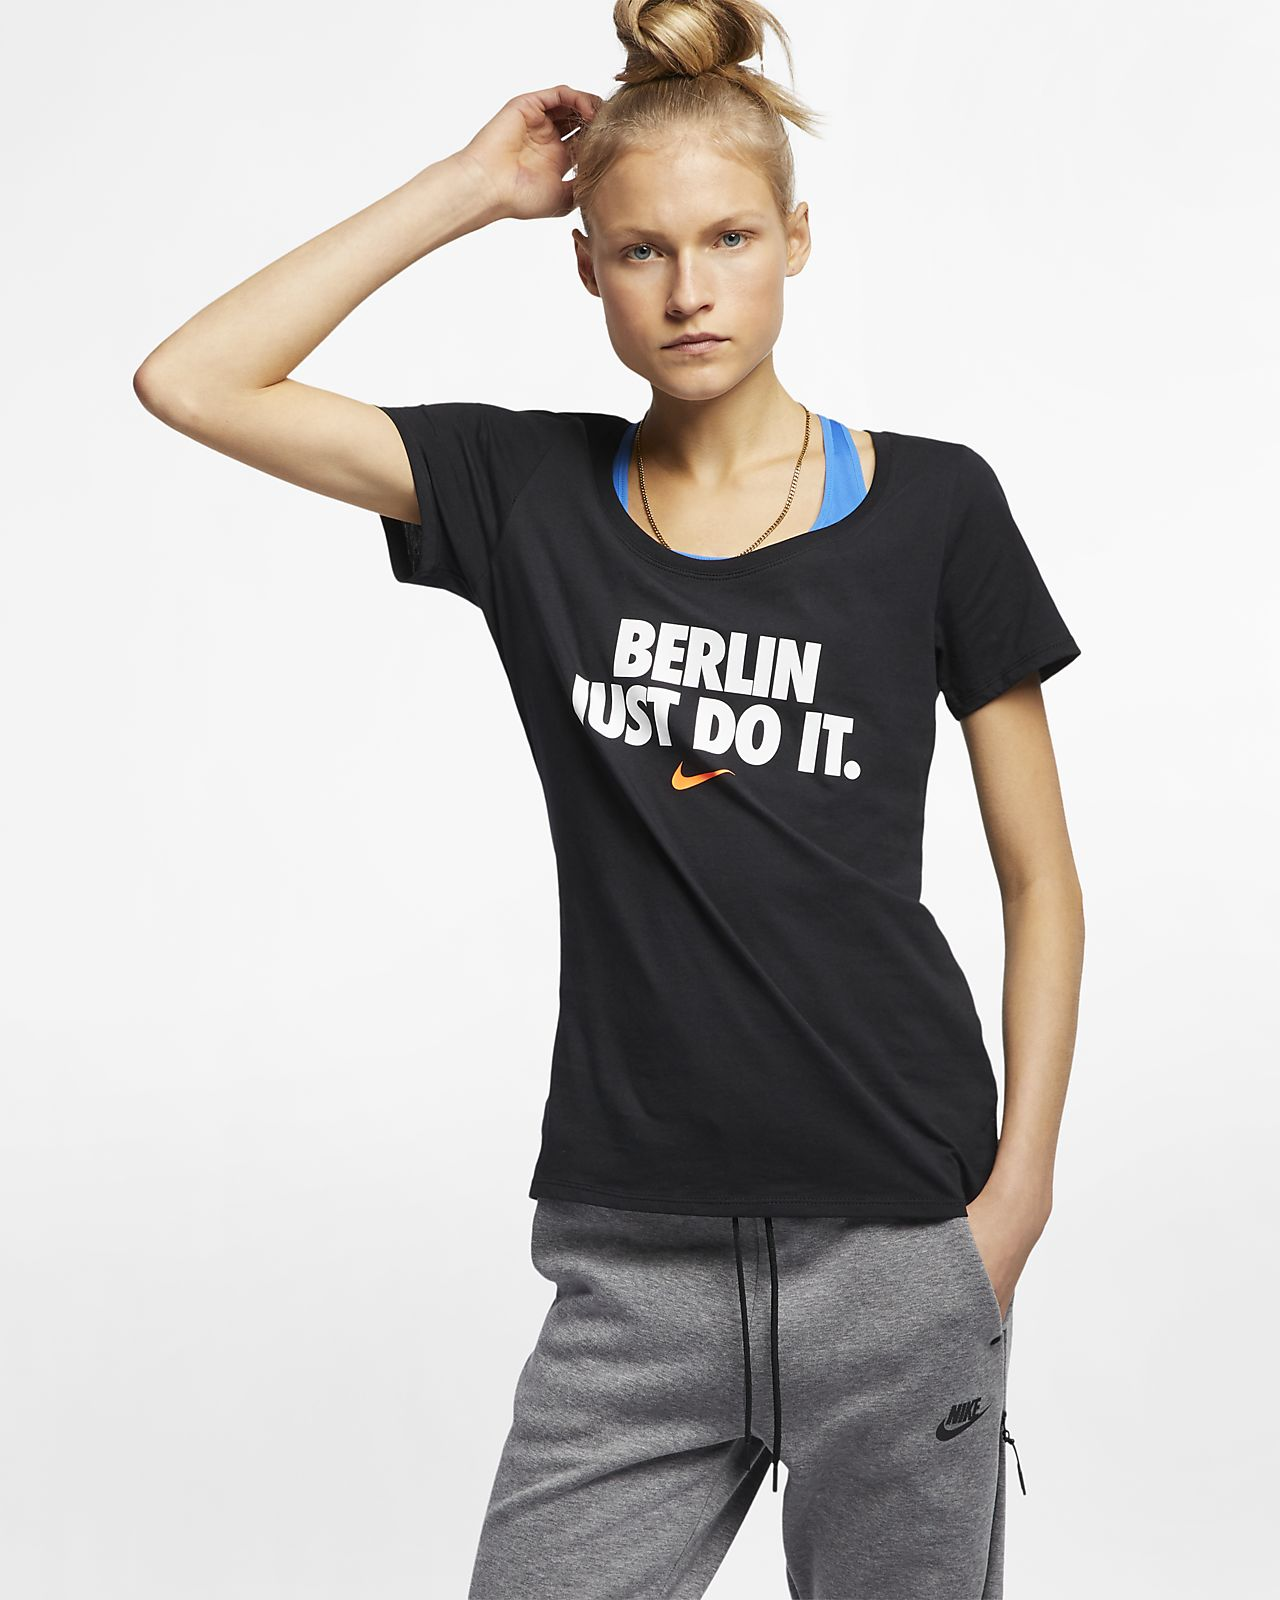 Tee-shirt JDI Nike Sportswear pour Femme